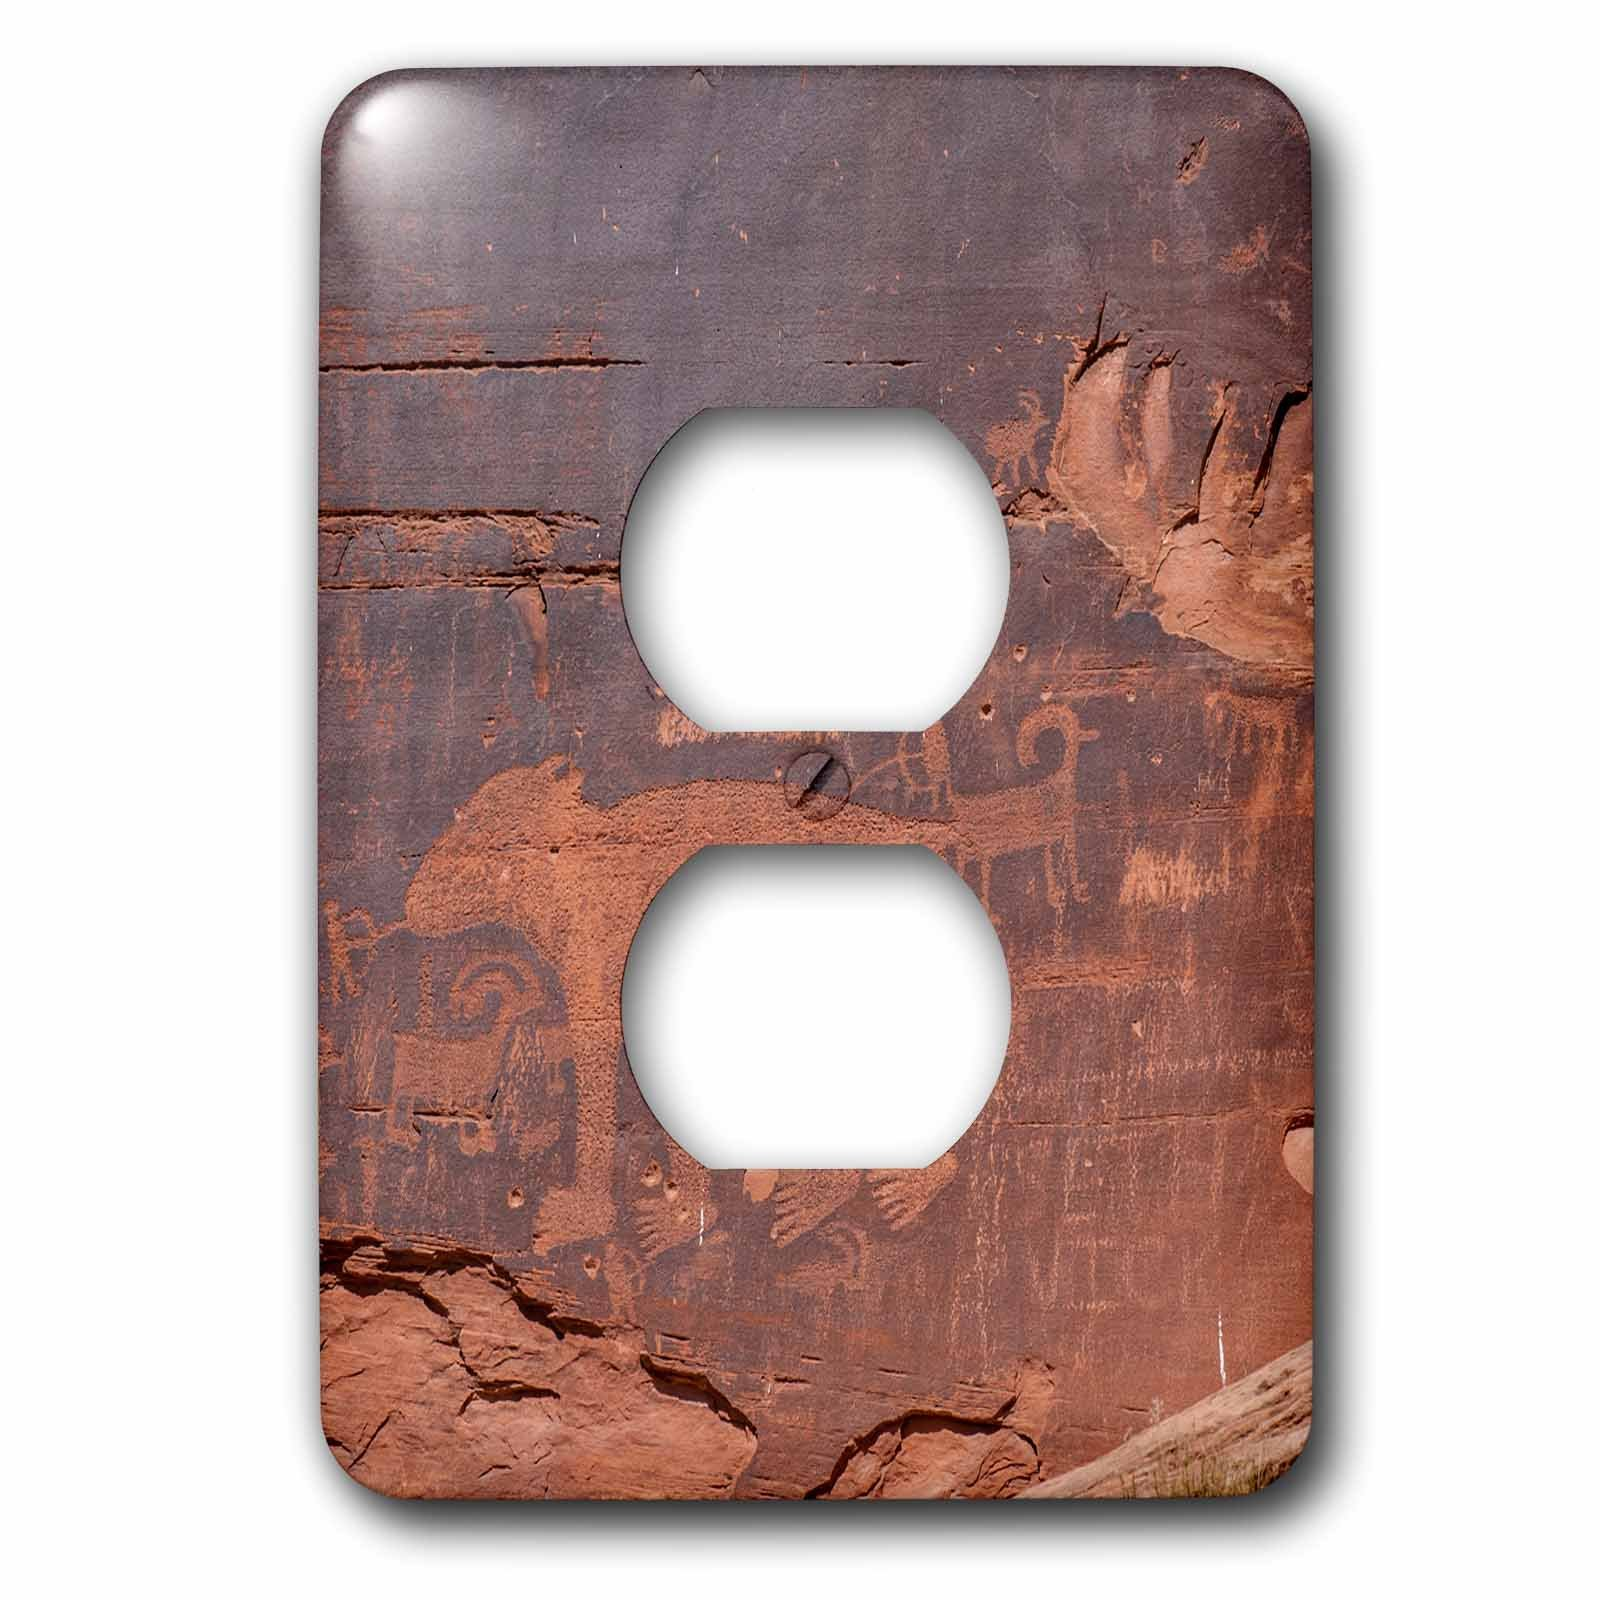 3dRose lsp_260359_6 Petroglyphs Rock Art, Arches National Park, Utah, USA Plug Outlet Cover, Mixed